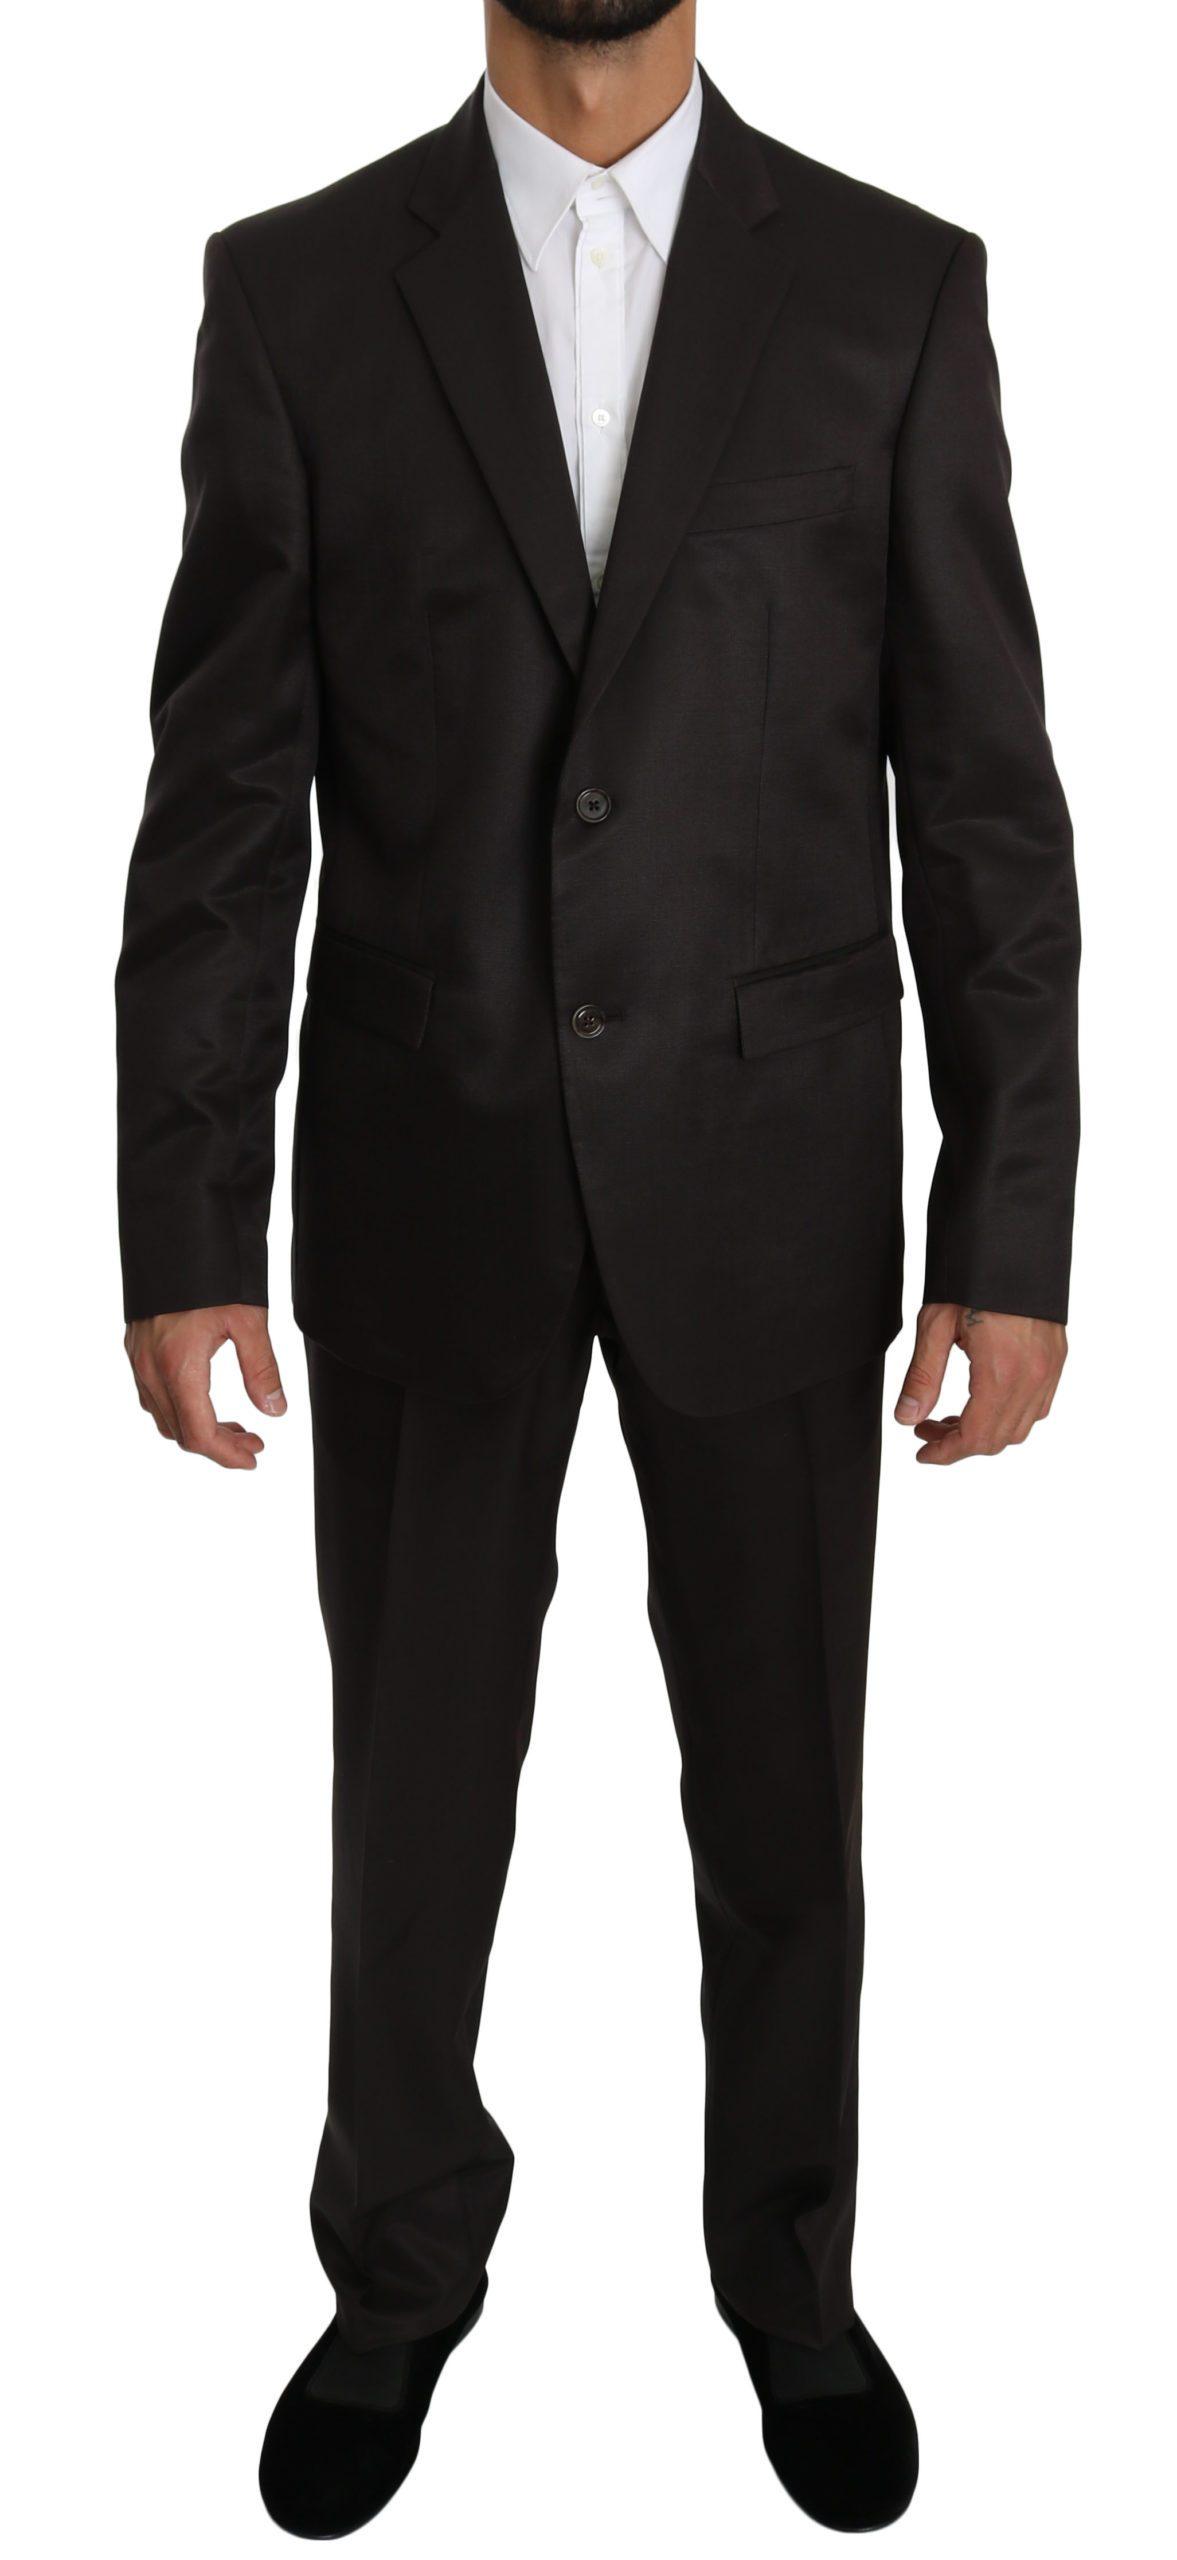 Dolce & Gabbana Men's Slim Fit 2 Piece Wool Silk Suit Brown KOS1609 - IT50 | L